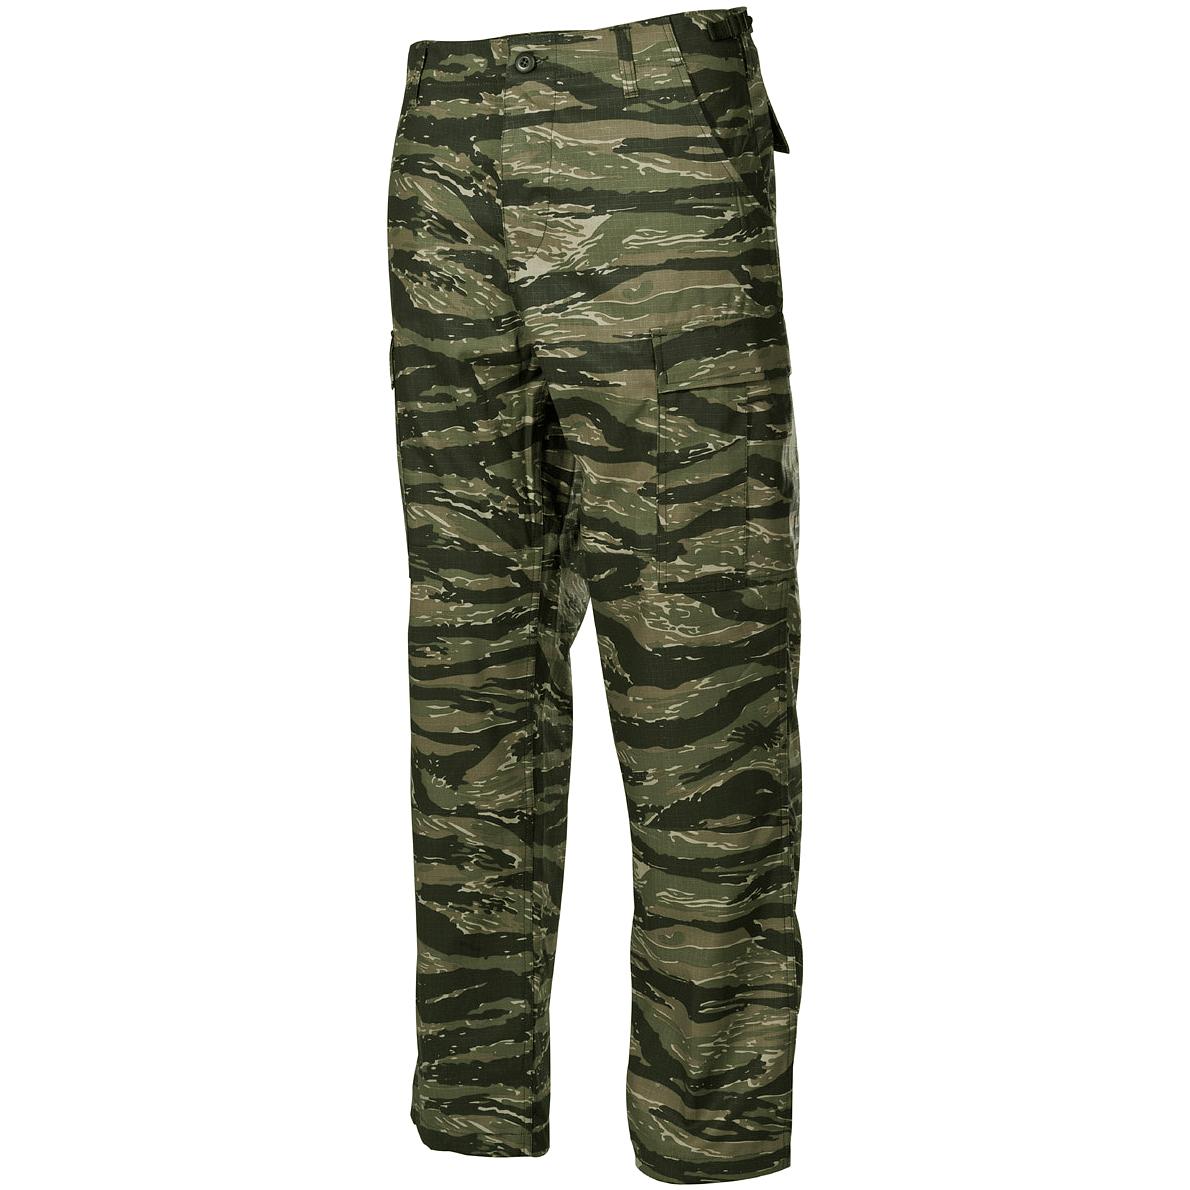 Classic Vietnam BDU Combat Trousers Mens Cargo Pants Ripstop Tiger Stripe Camo